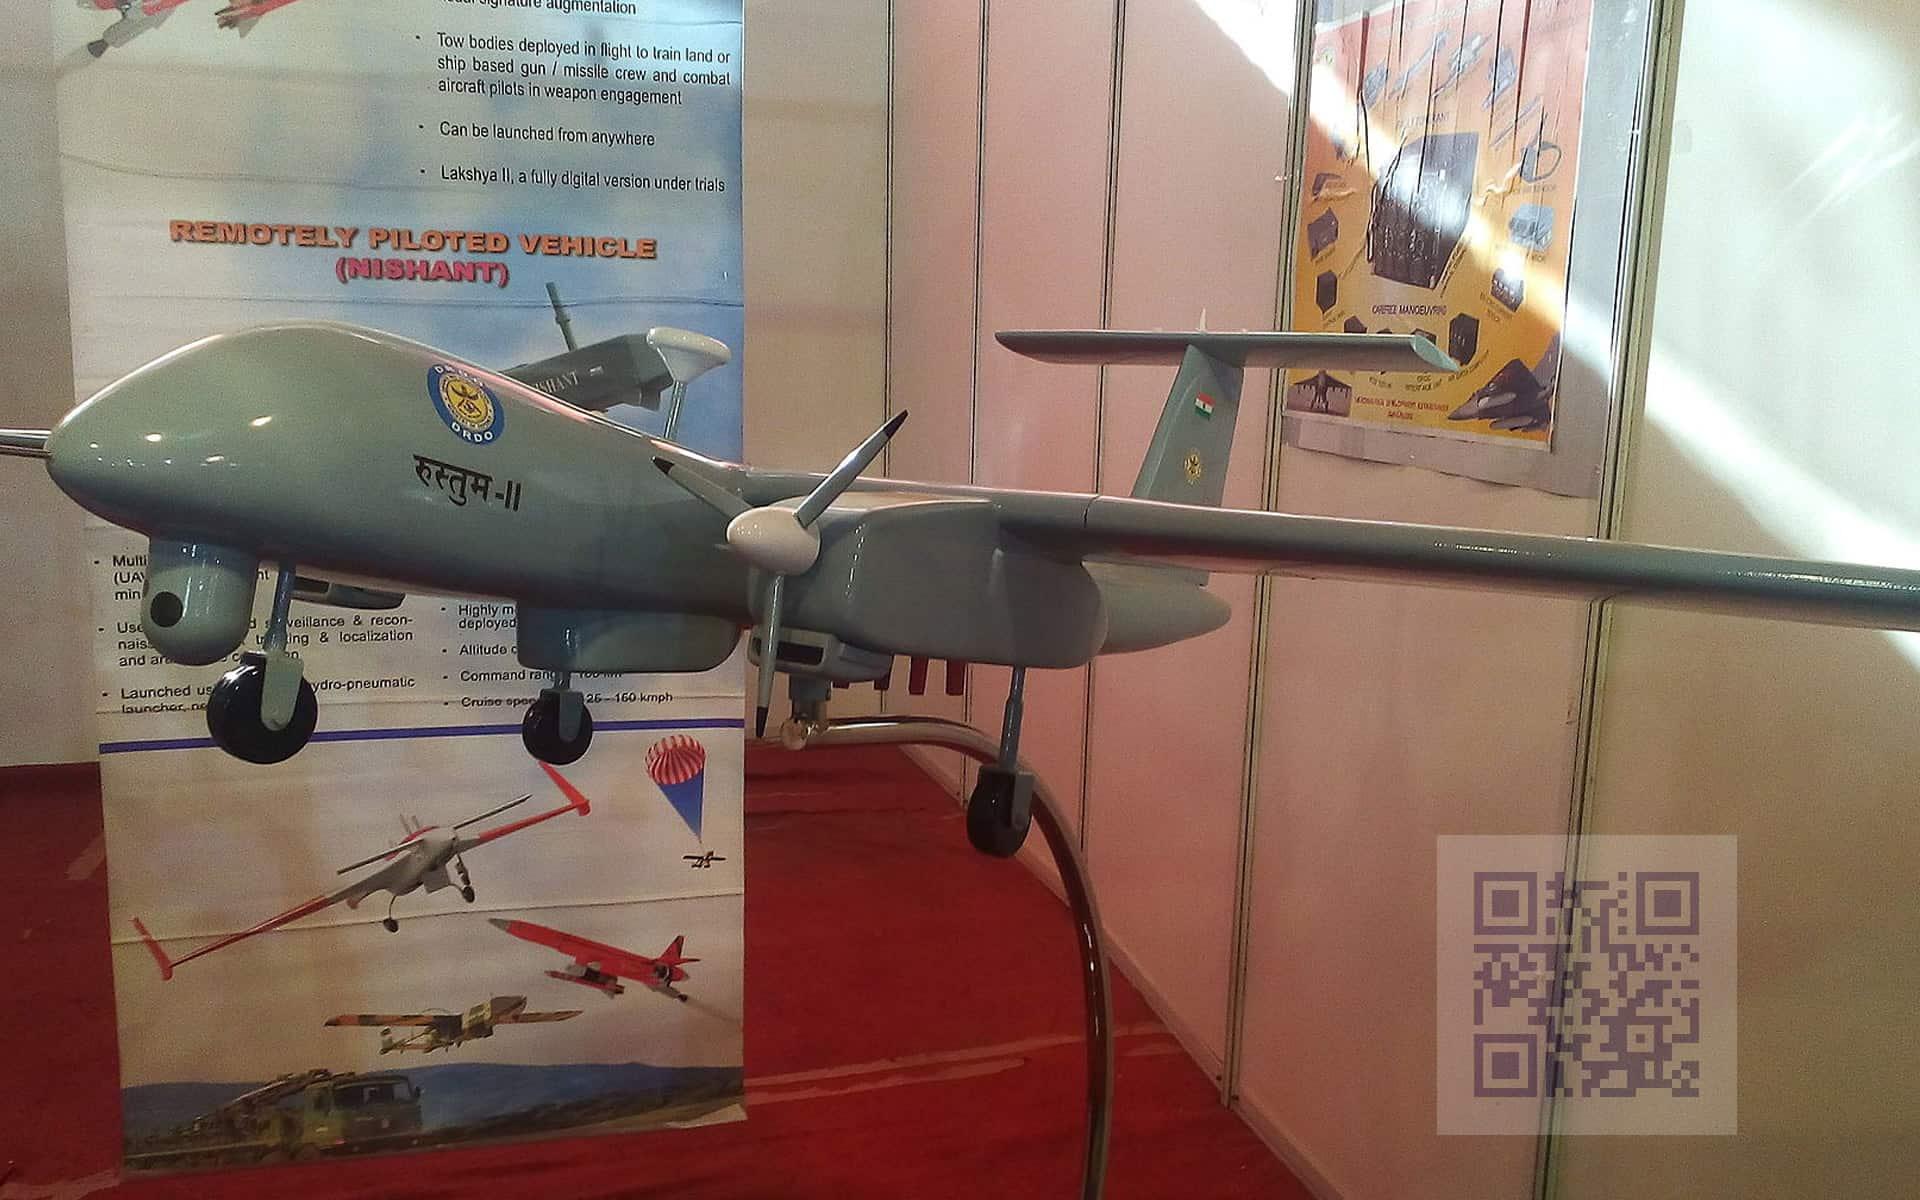 TAPAS-BH-201 - Rustom-2 model